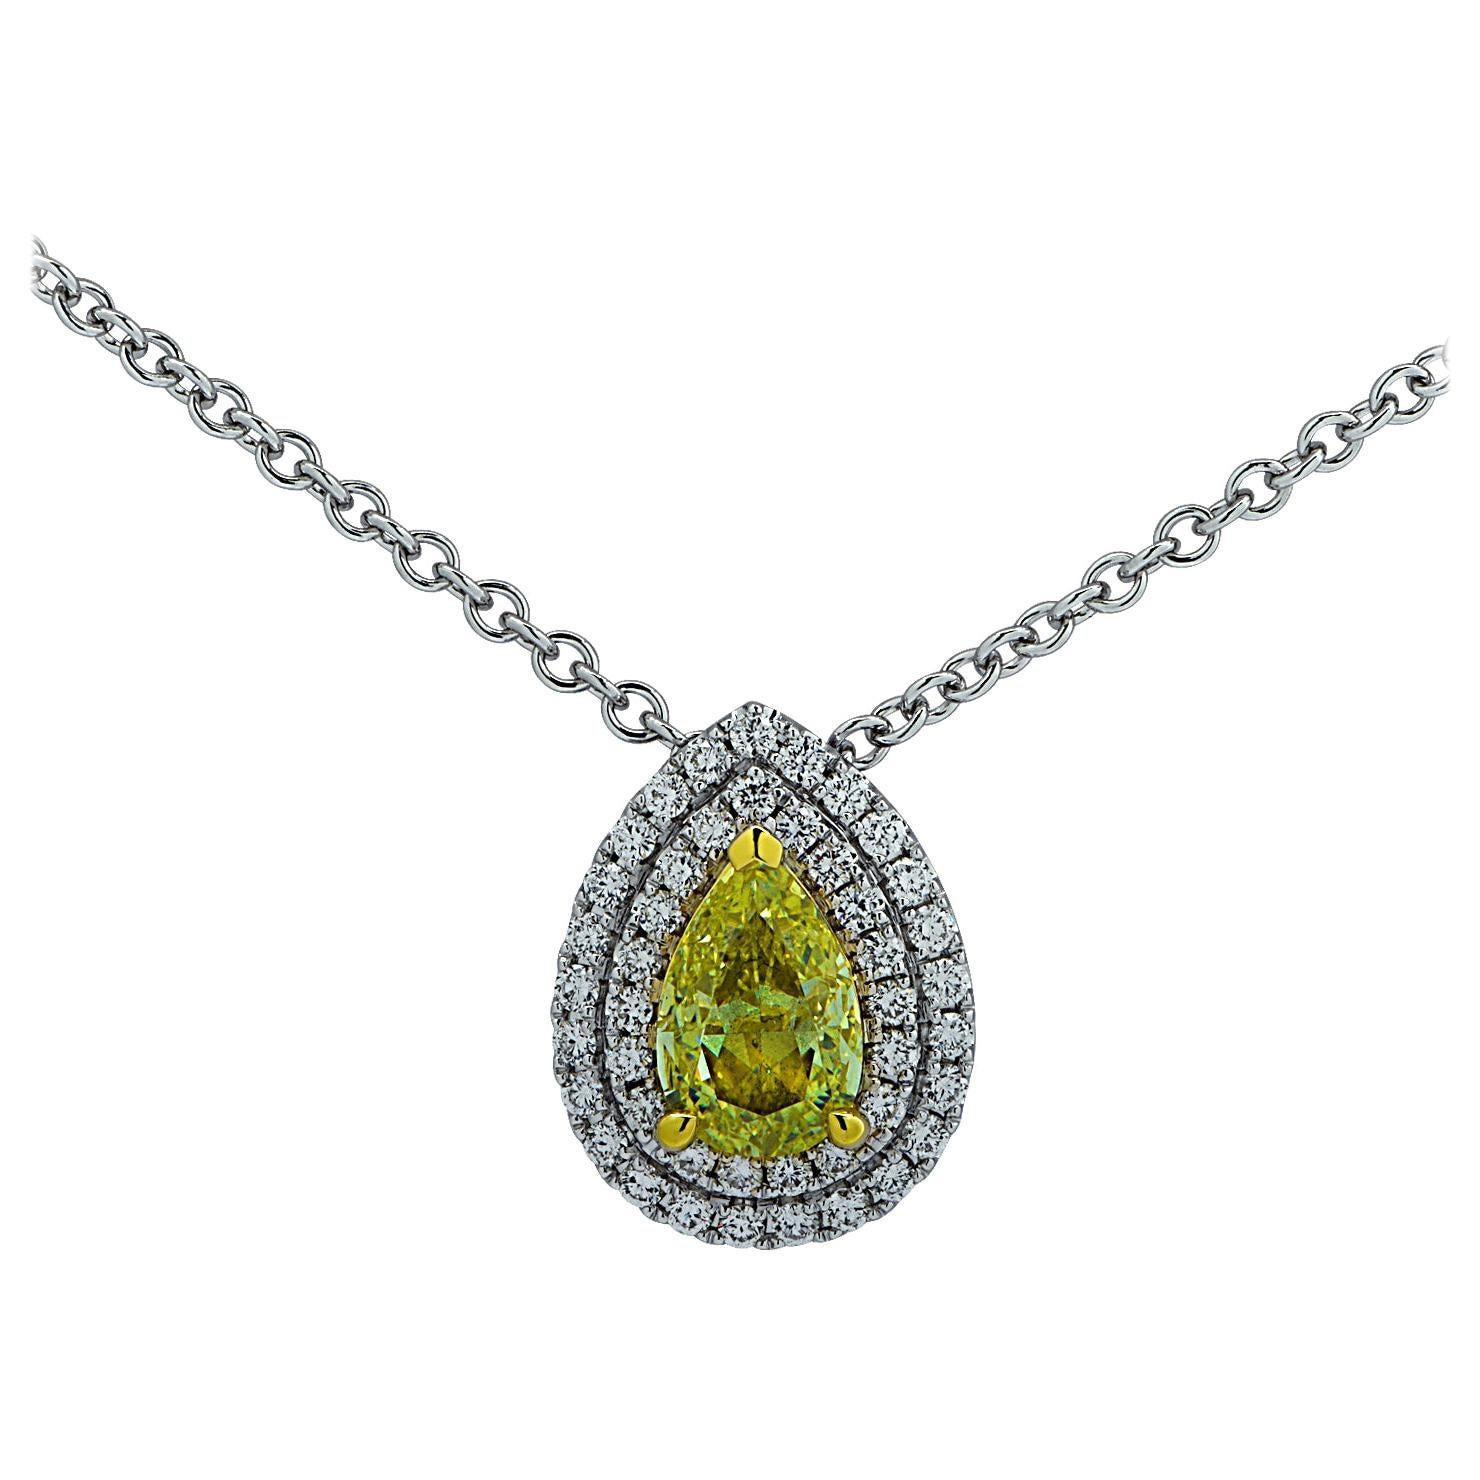 Vivid Diamonds GIA Certified 1.01 Carat Fancy Yellow Diamond Pendant Necklace